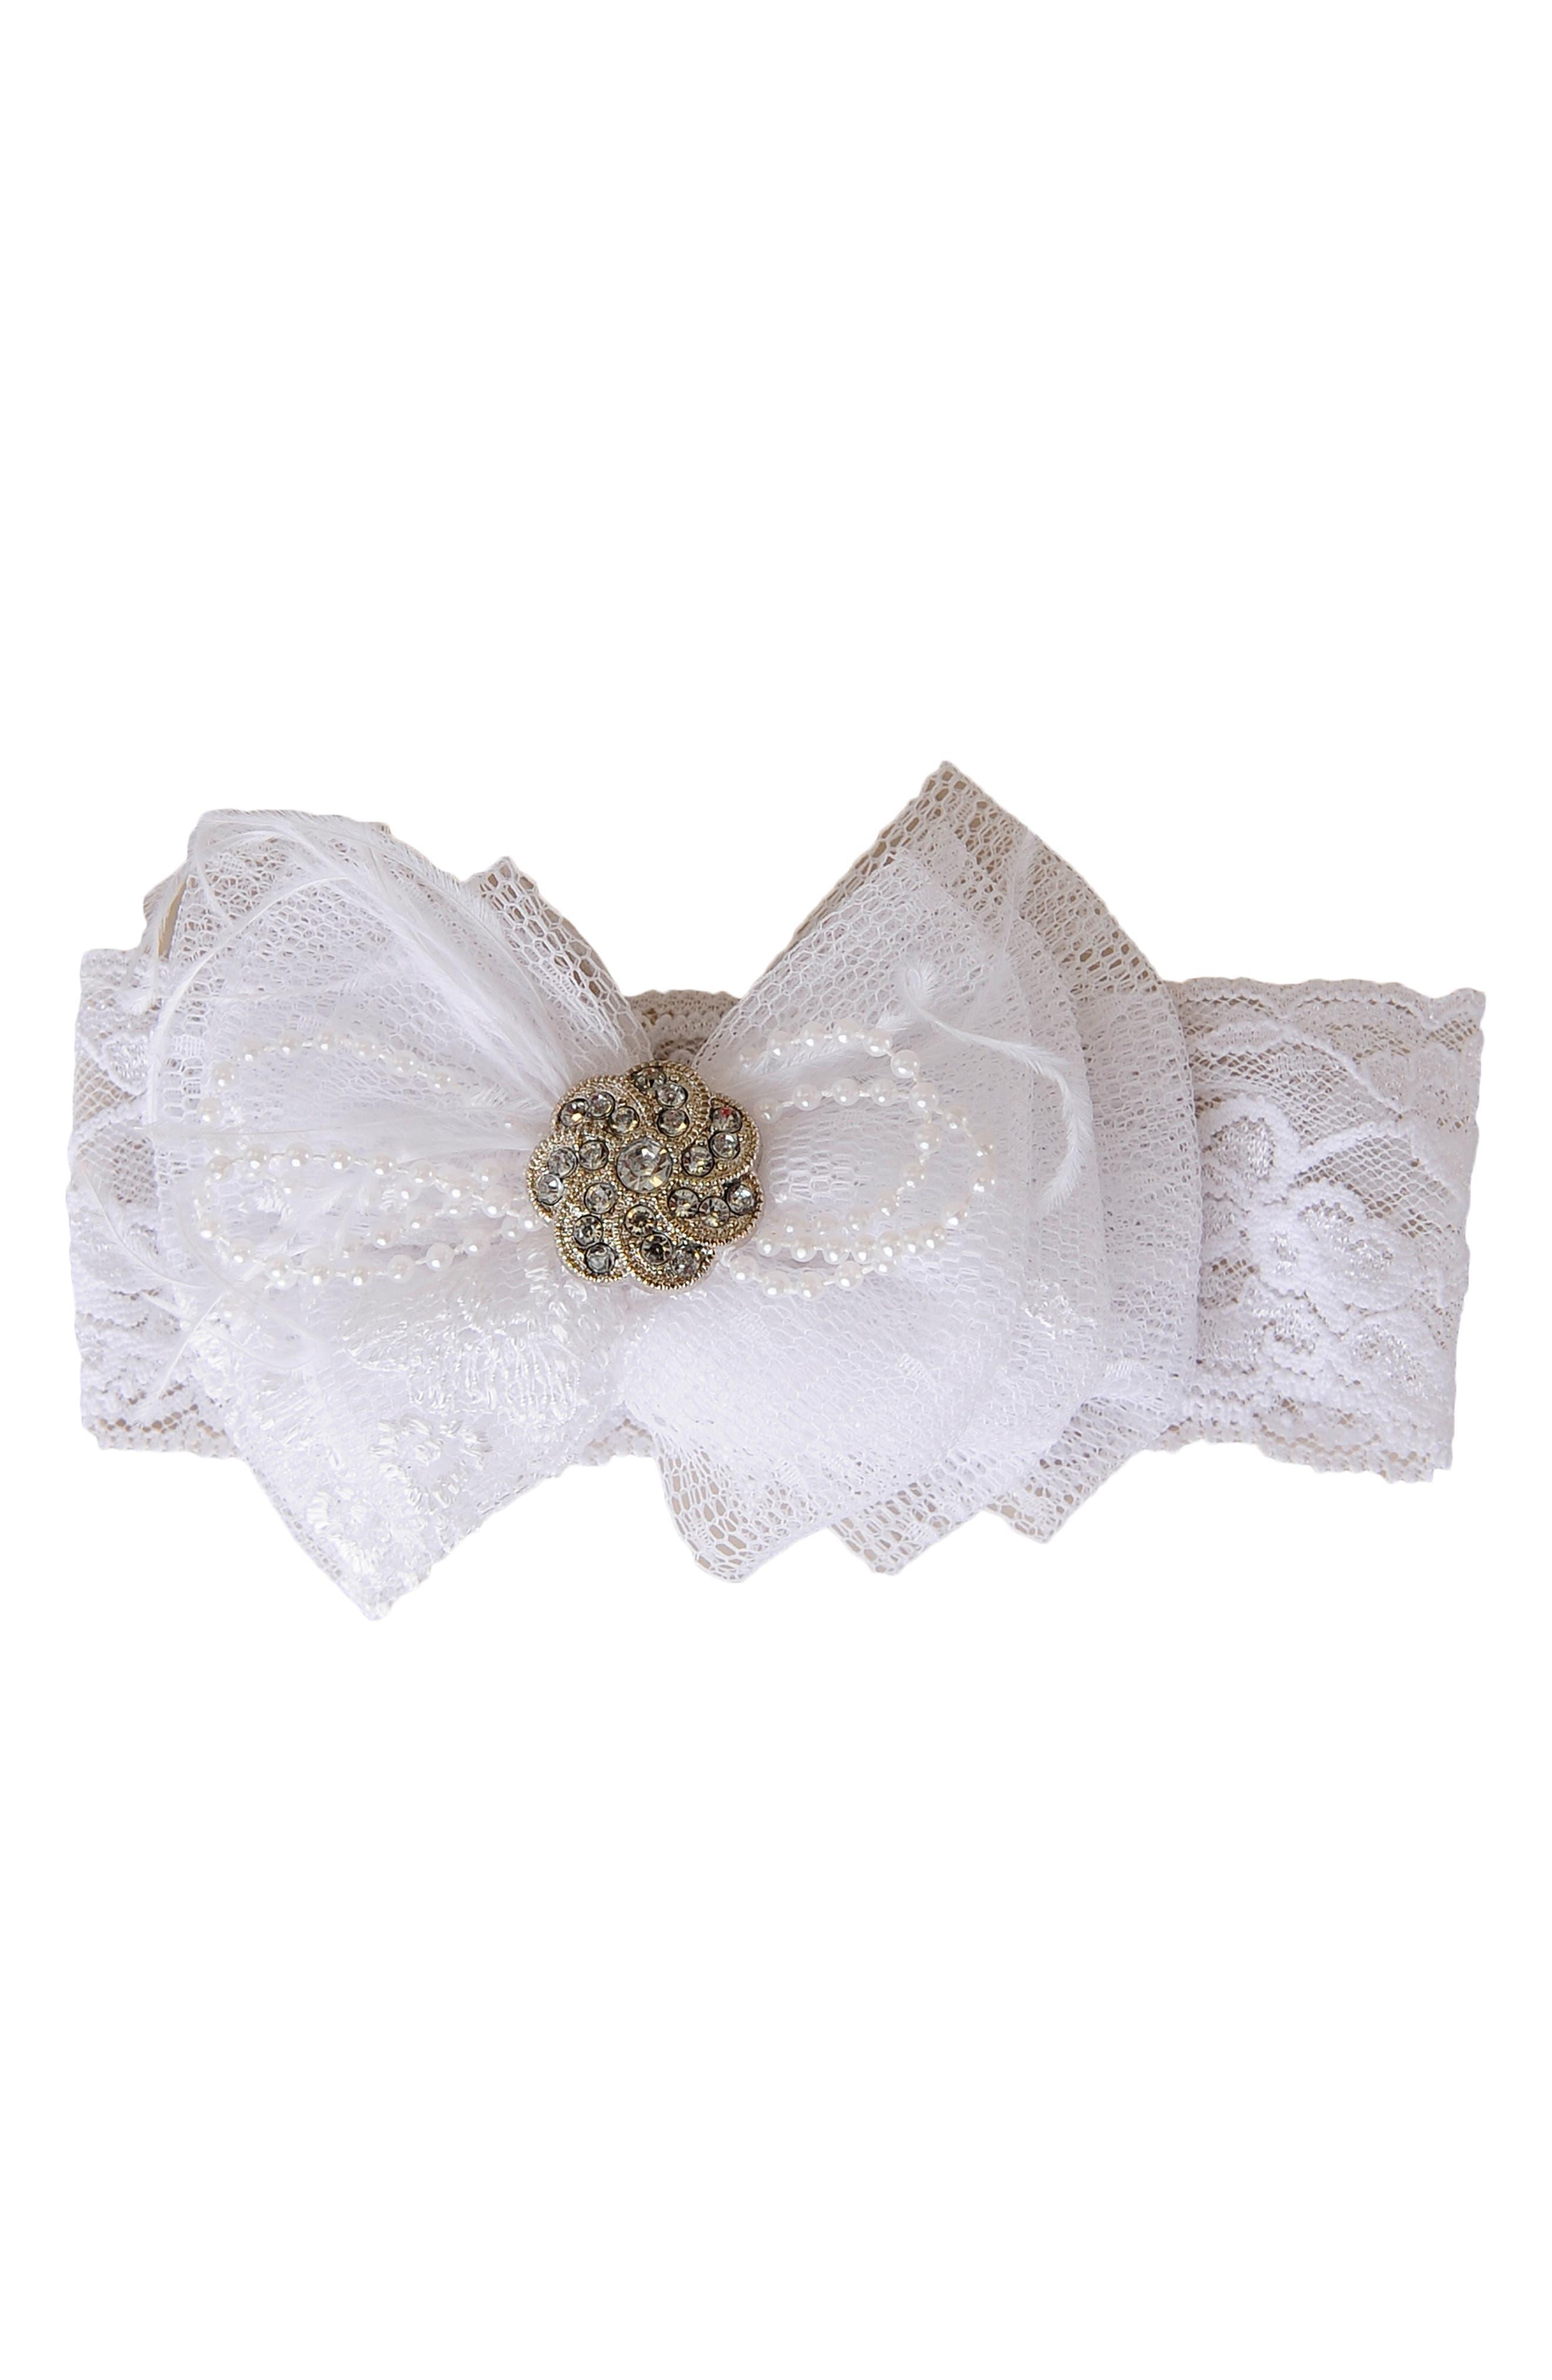 LITTLE THINGS MEAN A LOT, Christening Gown, Shawl, Slip & Bonnet Set, Alternate thumbnail 3, color, WHITE